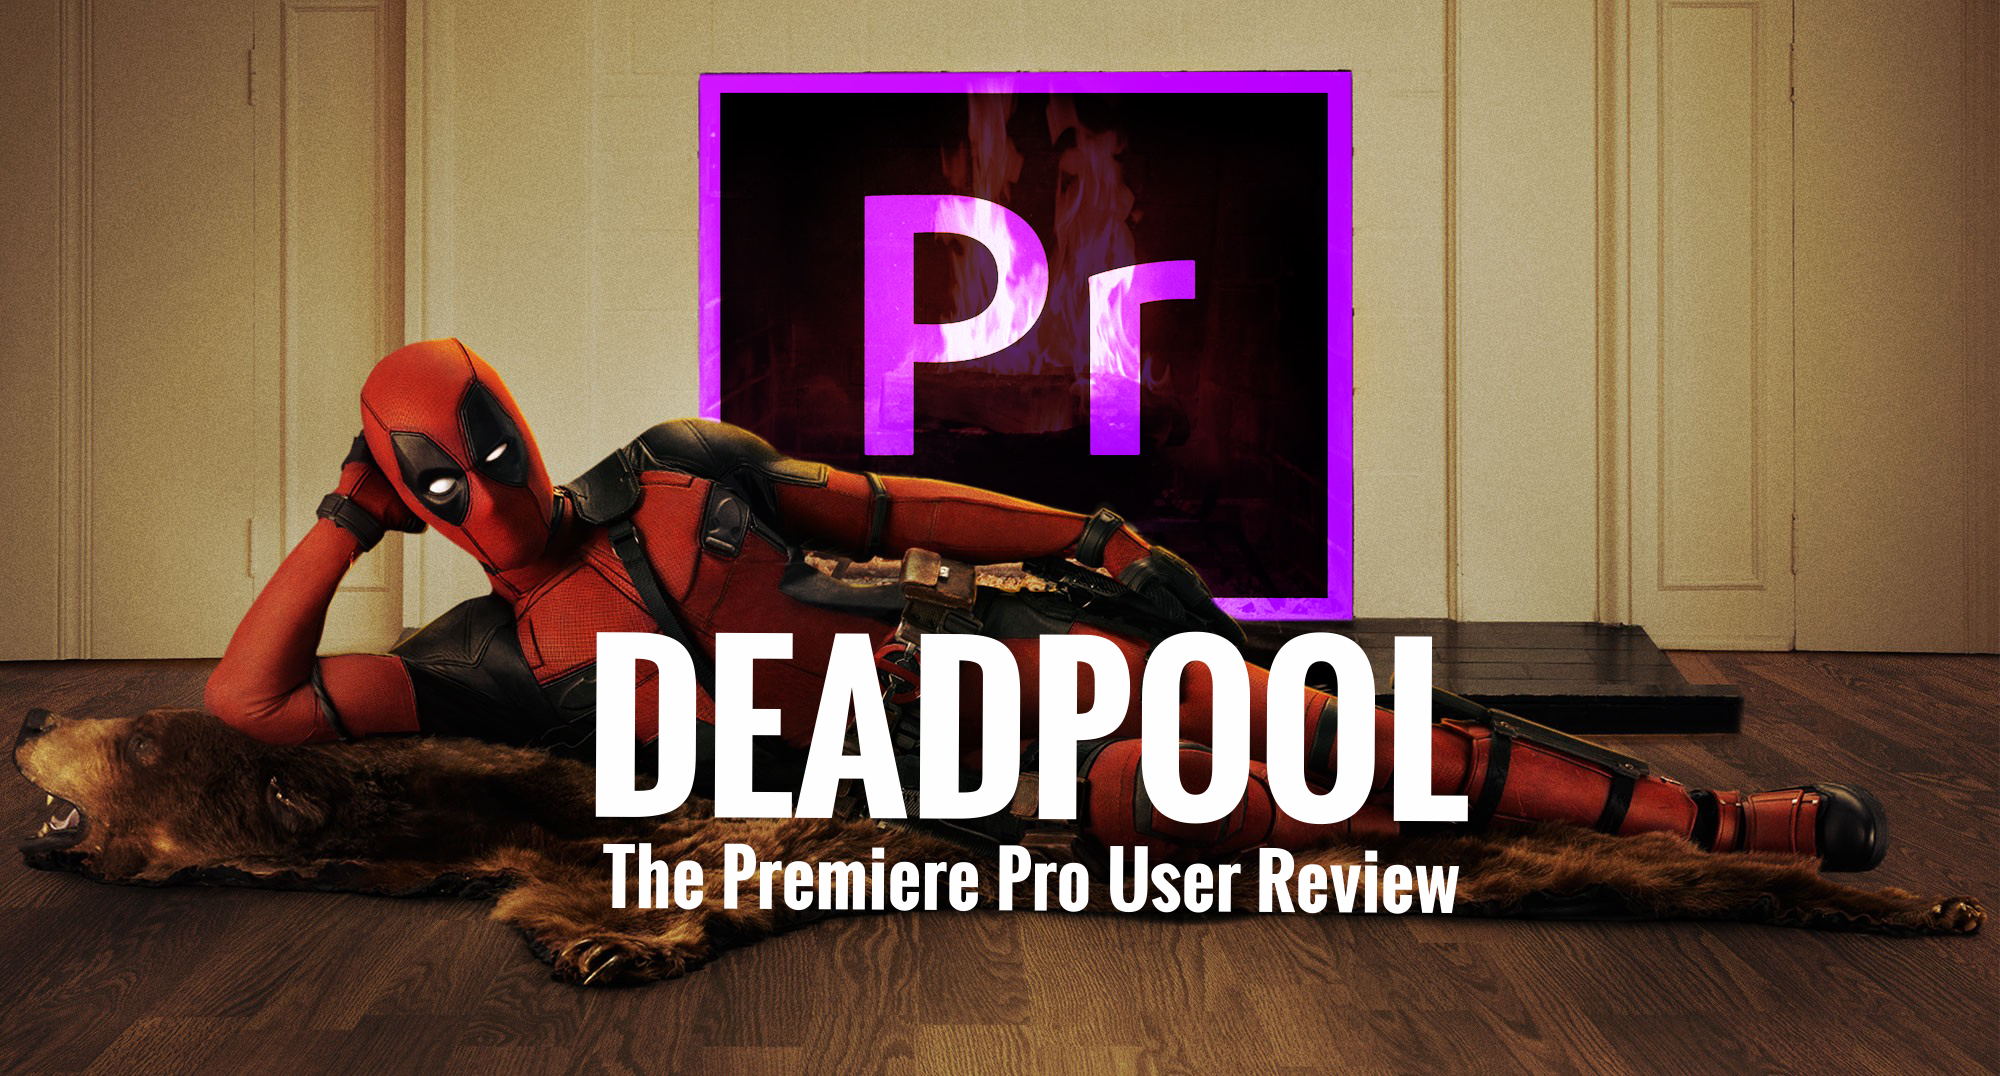 deadpool-premiere-pro